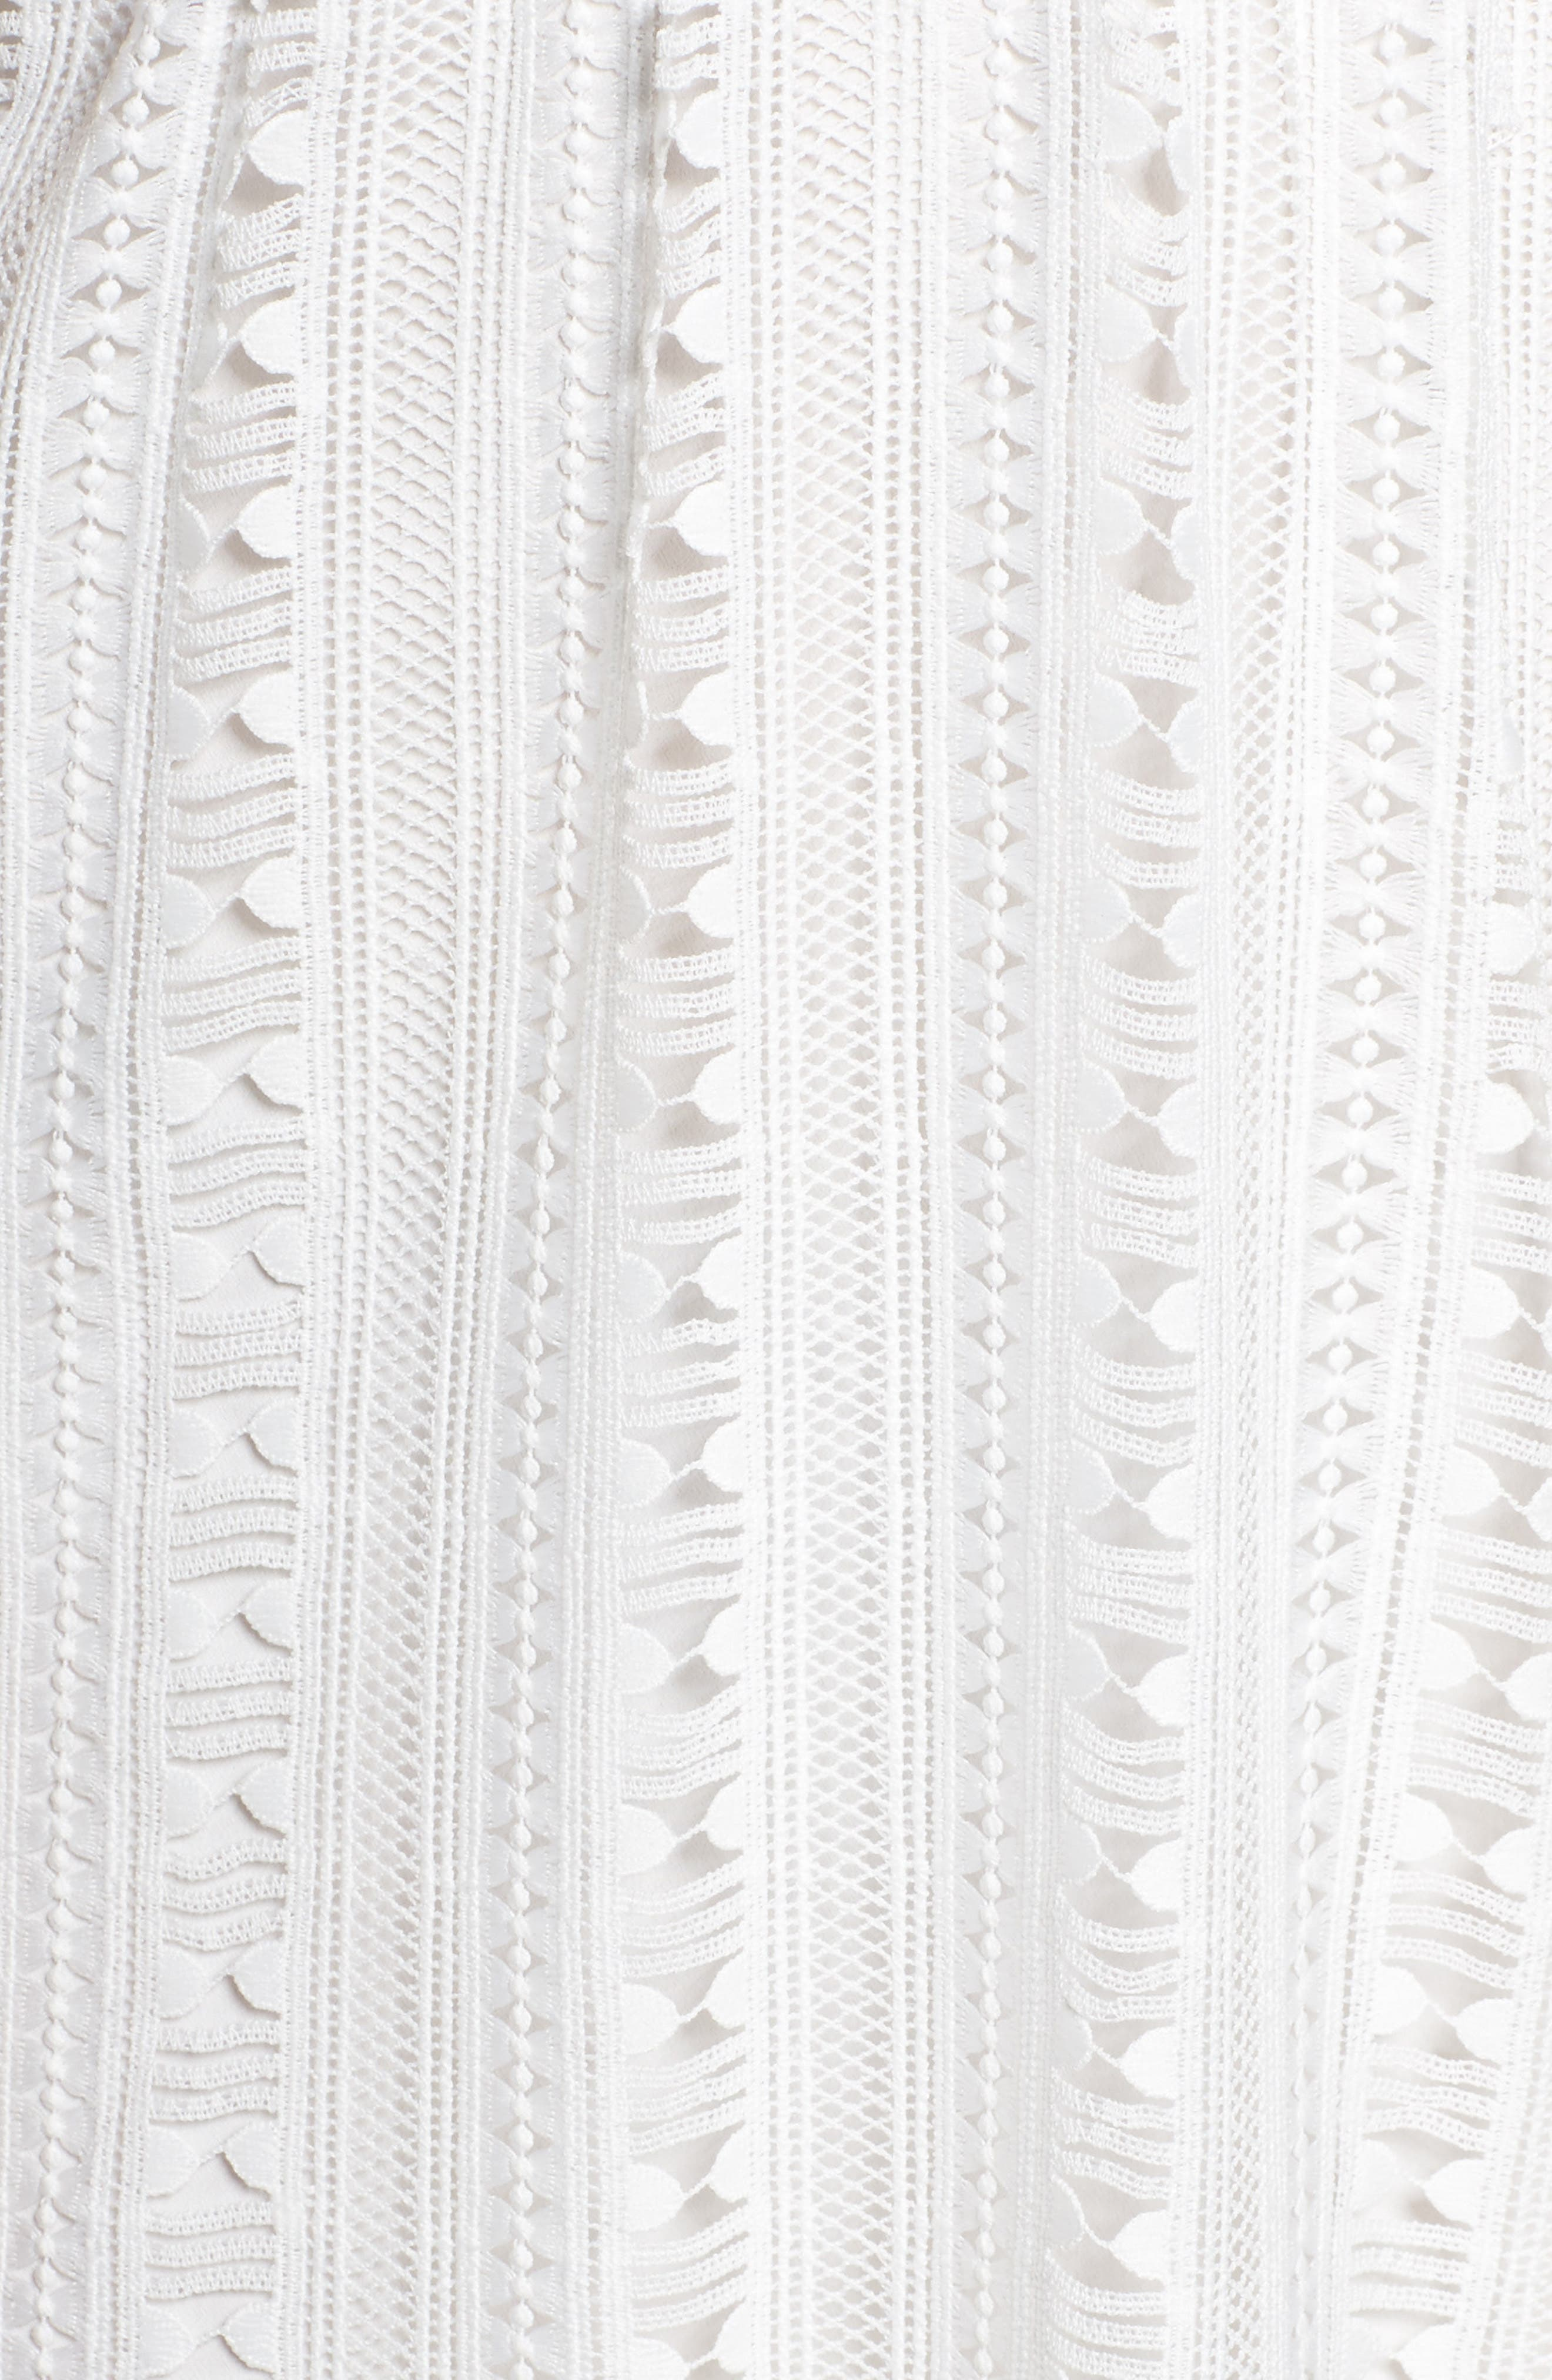 Belissimo Lace Fit & Flare Midi Dress,                             Alternate thumbnail 6, color,                             White